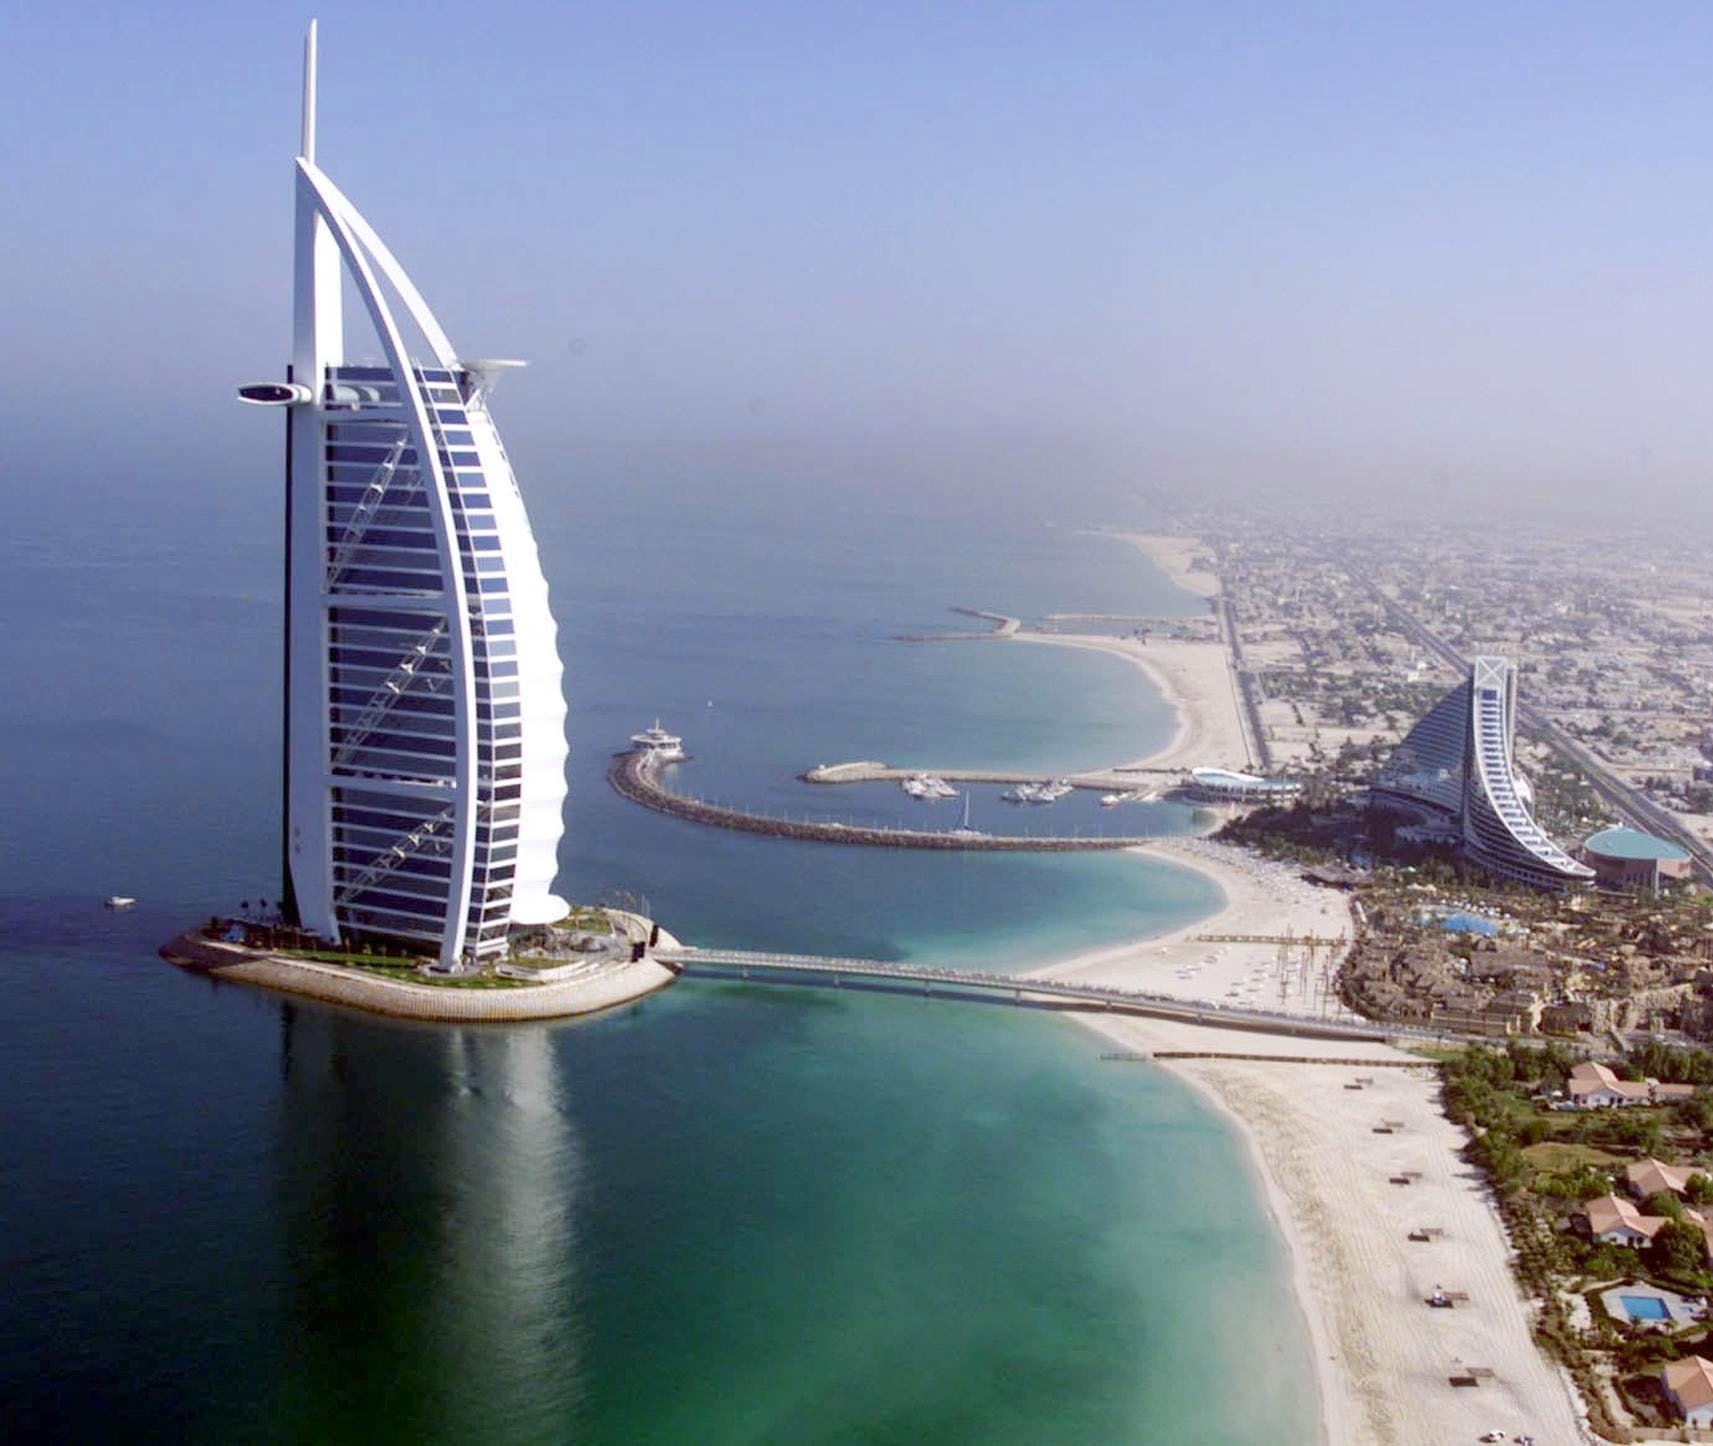 Awesome Aerial View of Burj Al Arab Hotel, Dubai, United Arab Emirates